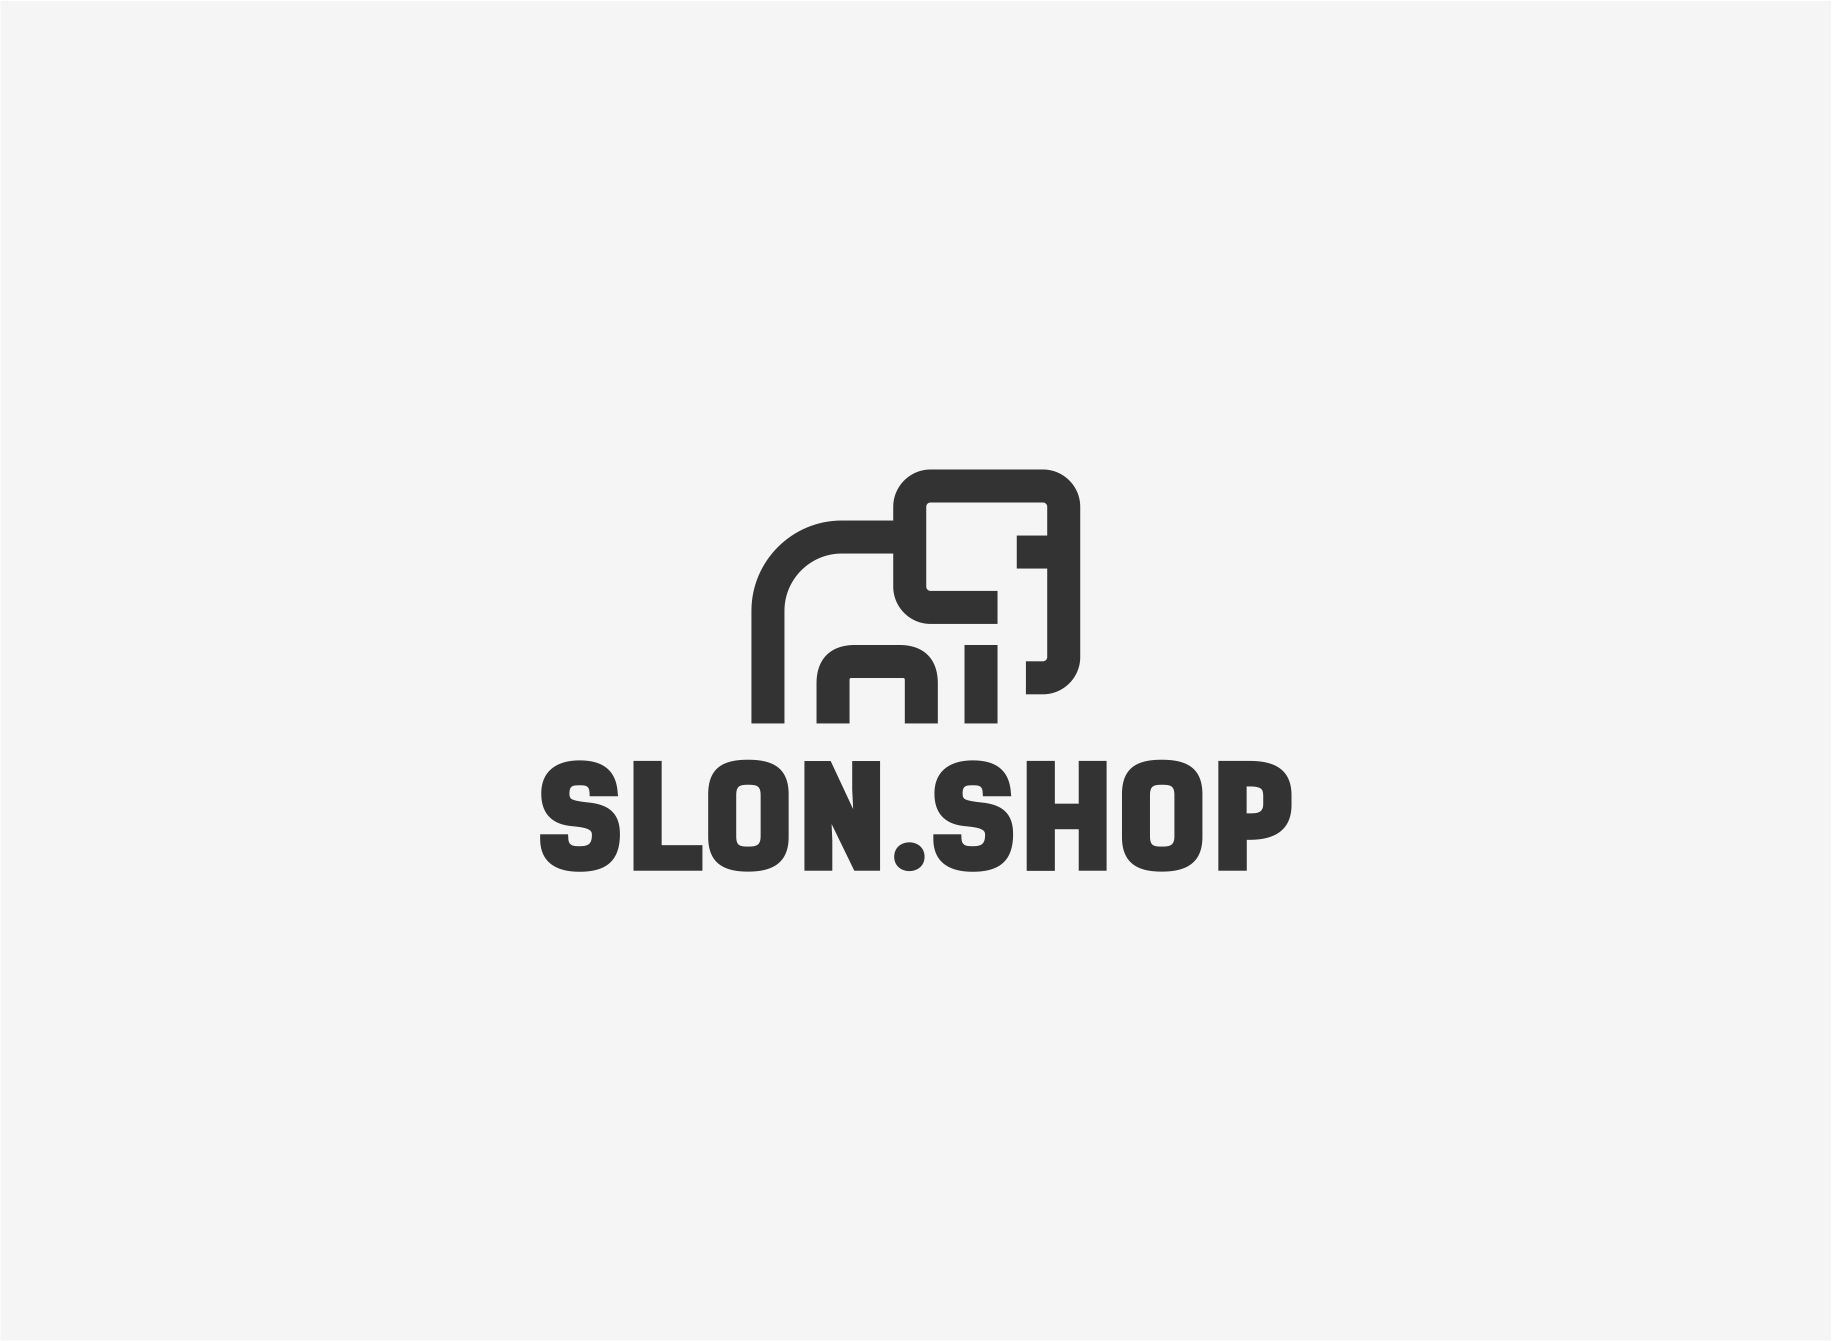 Разработать логотип и фирменный стиль интернет-магазина  фото f_279598db5fa7585f.jpg